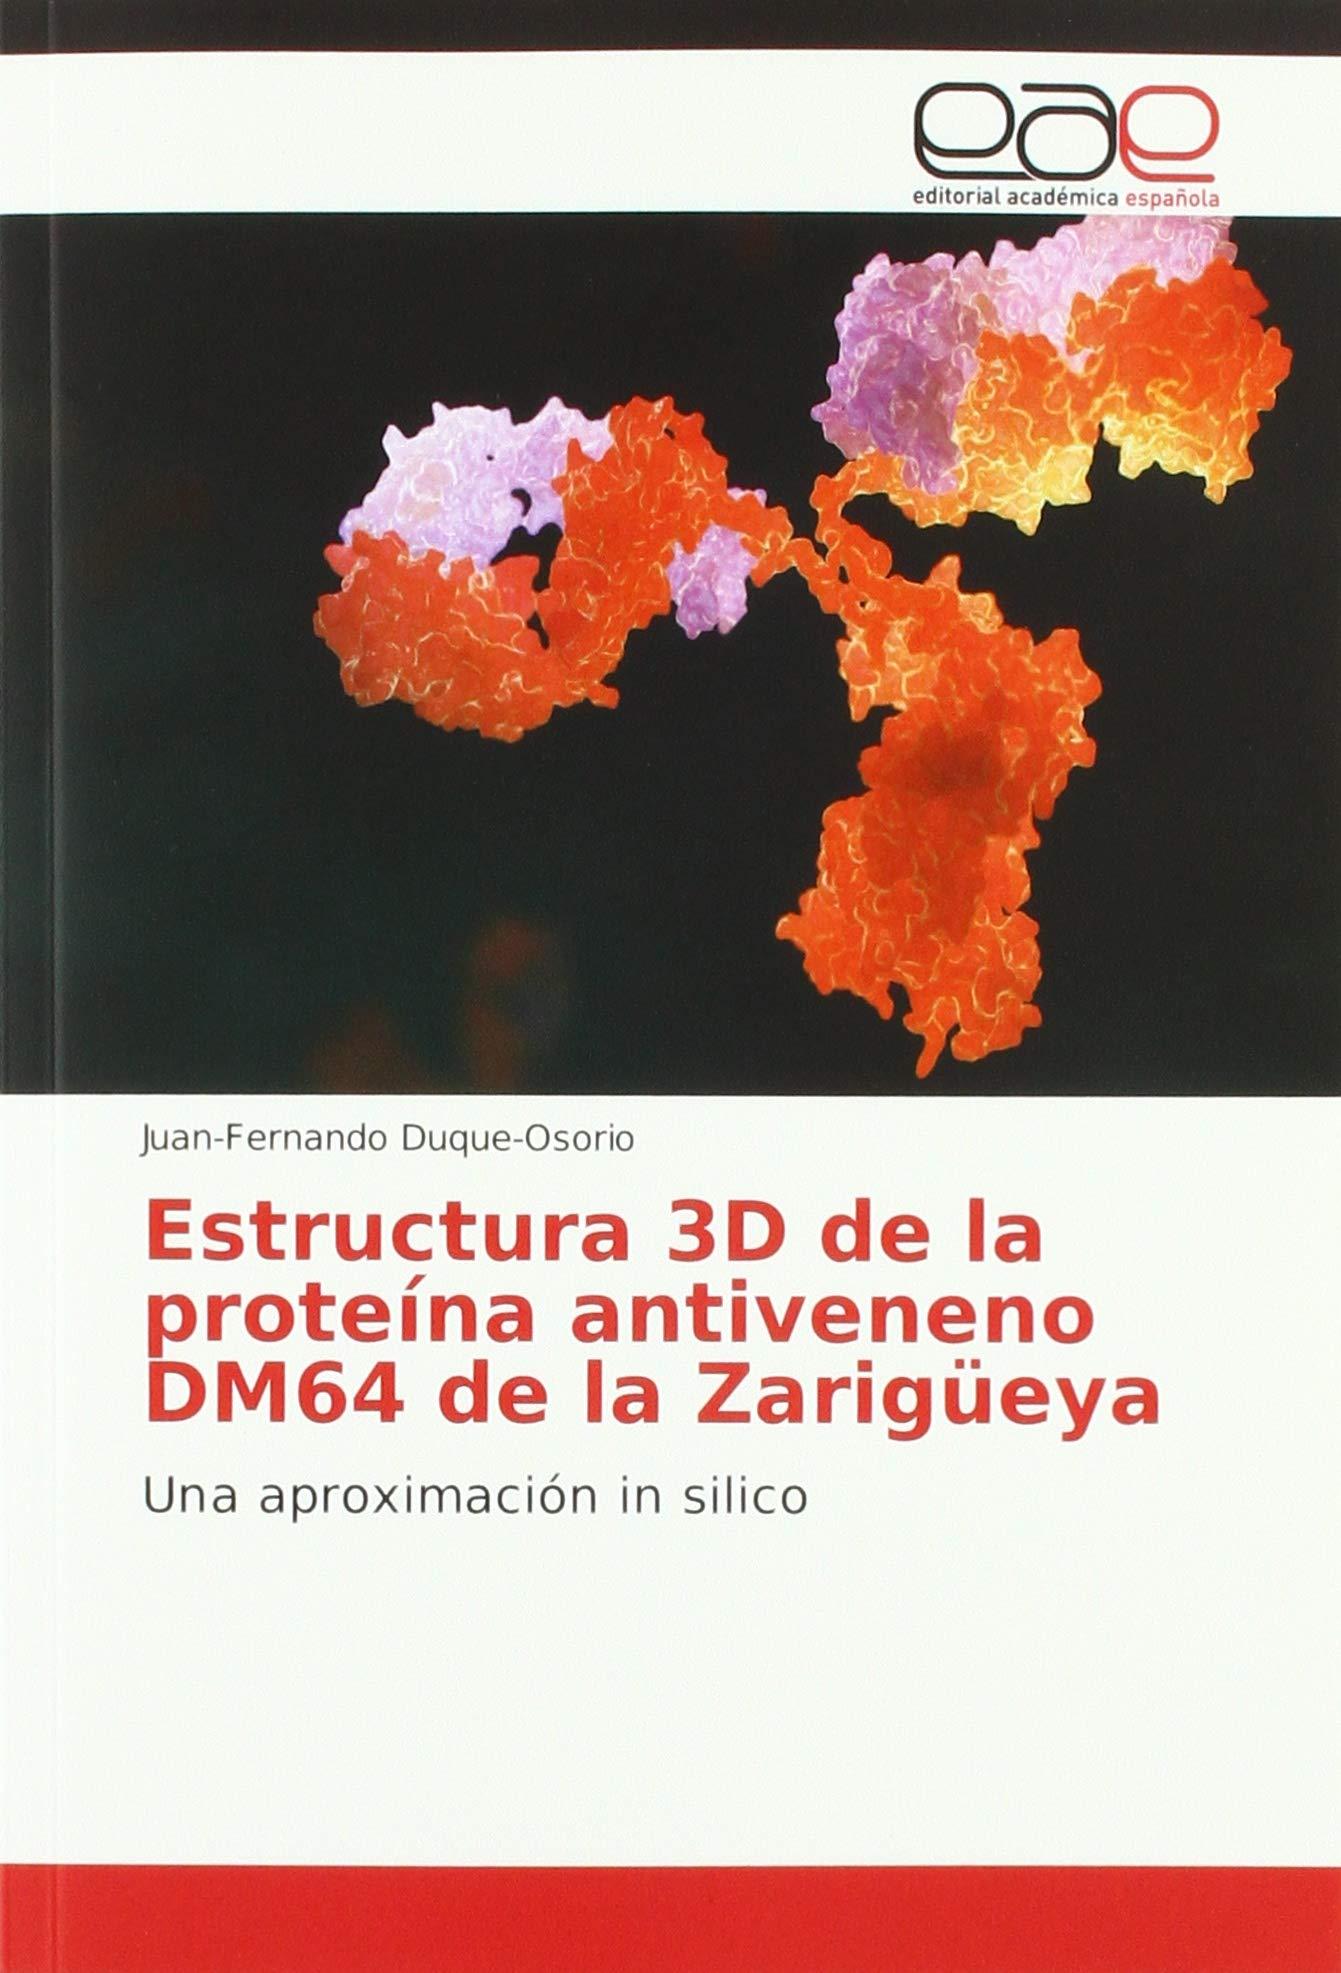 Duque-Osorio, J: Estructura 3D de la proteína antiveneno DM6 ...